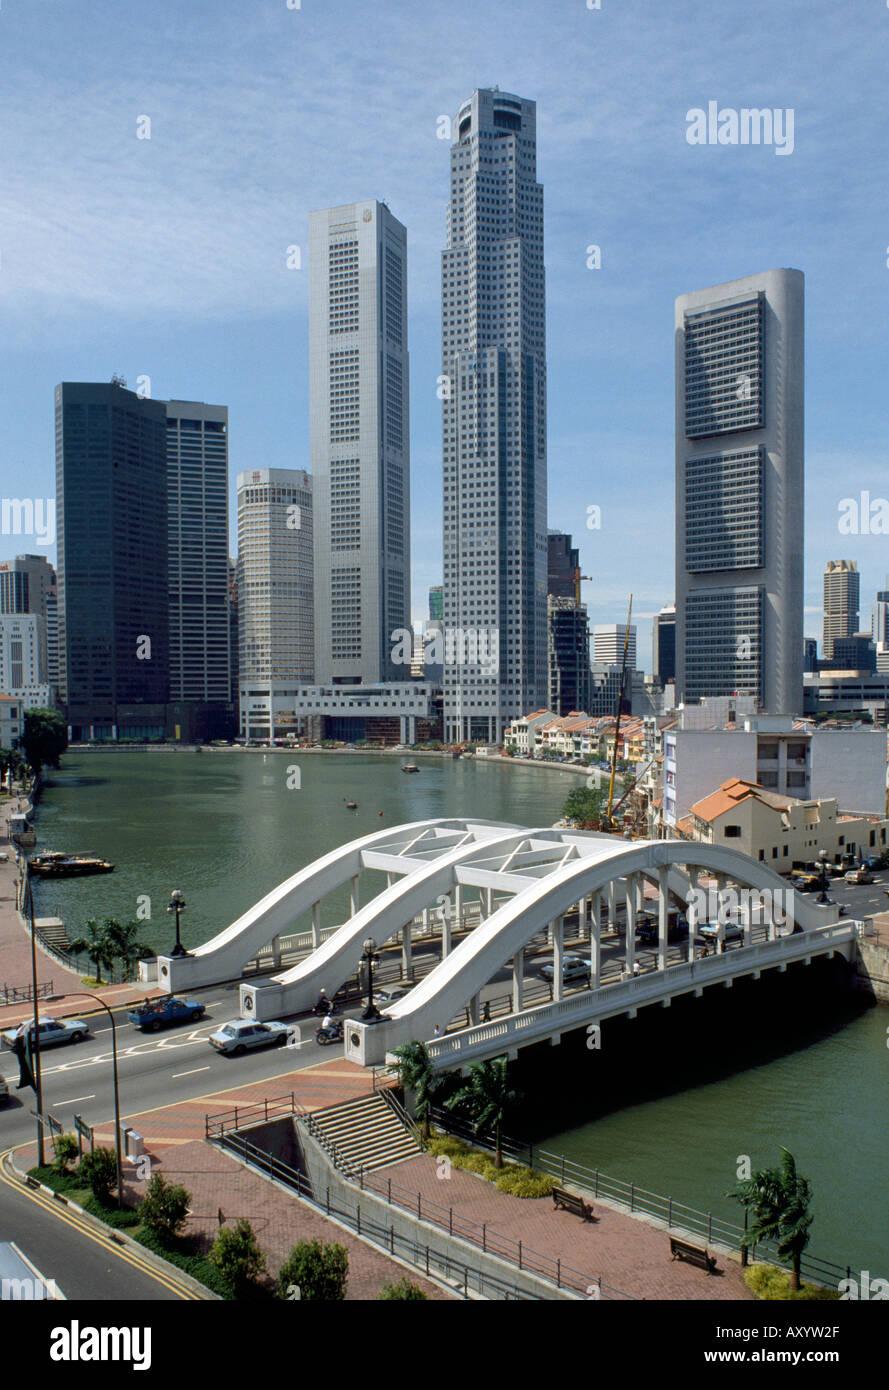 Singapur, Skyline am Singapore River, Innenstadt - Stock Image